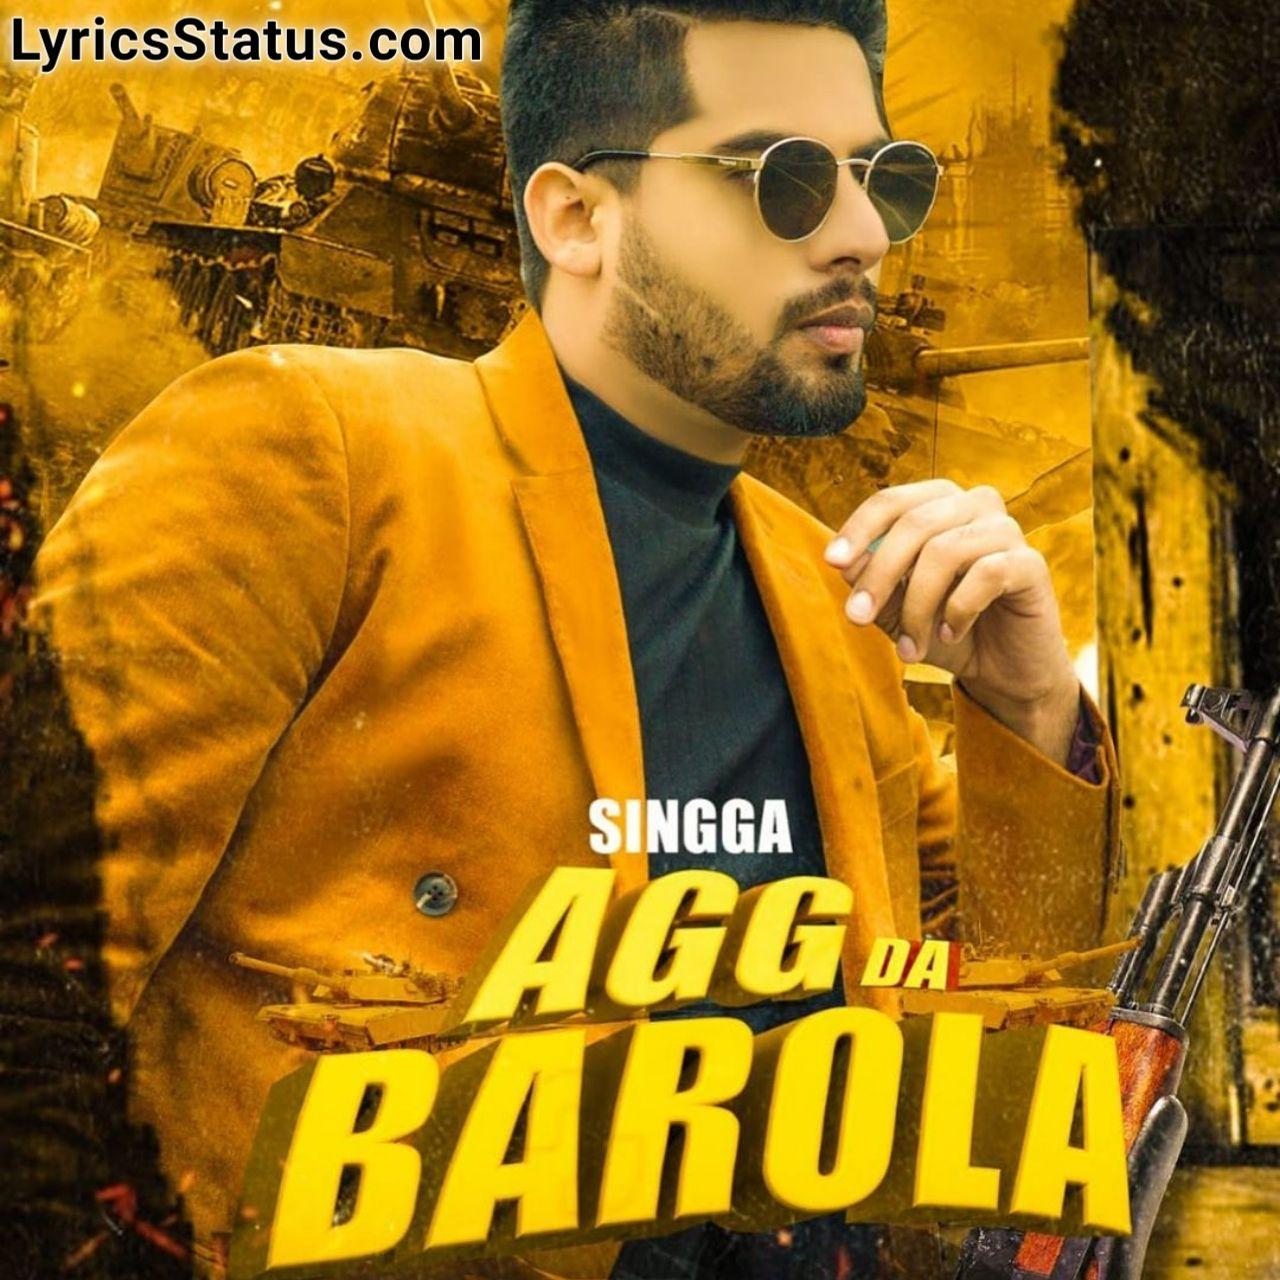 Singga New Song Agg Da Barola Lyrics Status Download Video In 2020 Songs Gangsta Song Latest Song Lyrics